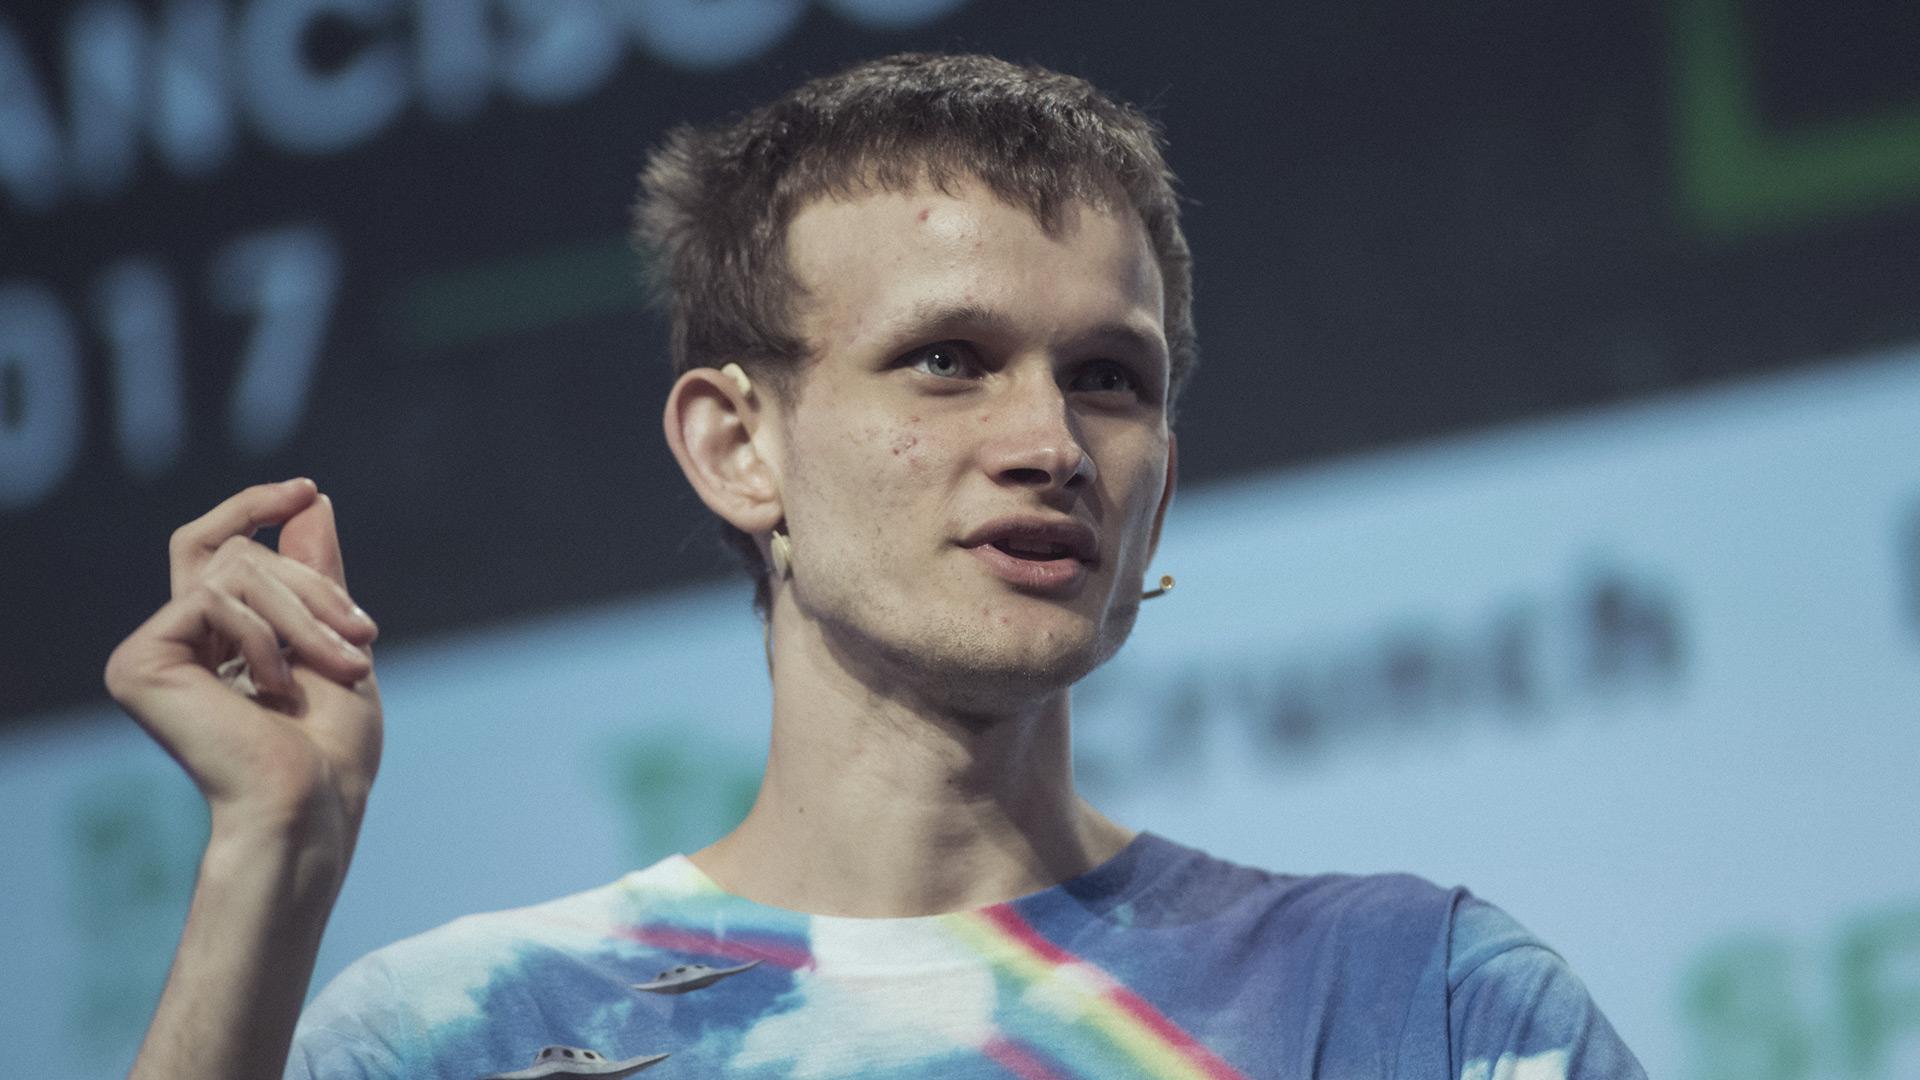 Uniswap's UNI should become an oracle token, says Vitalik Buterin